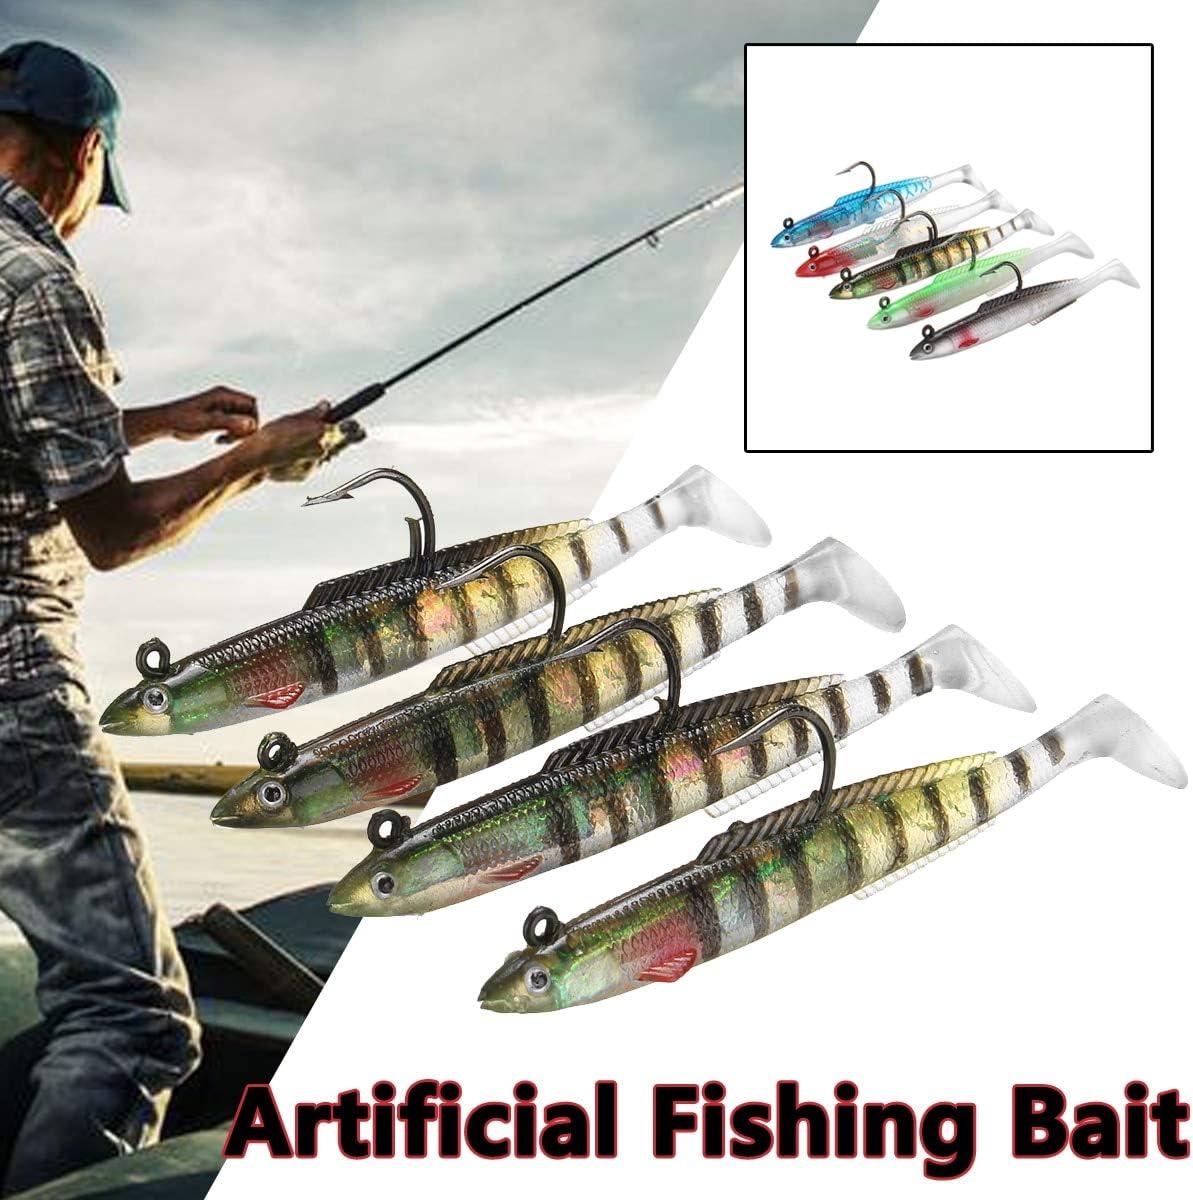 CUSHY 4PCS//Set Artificial Fish Fishing Lure Soft 3D Eyes 10cm 10g Cod Bass Wrasse Ling Sea Fishing Lures s Red